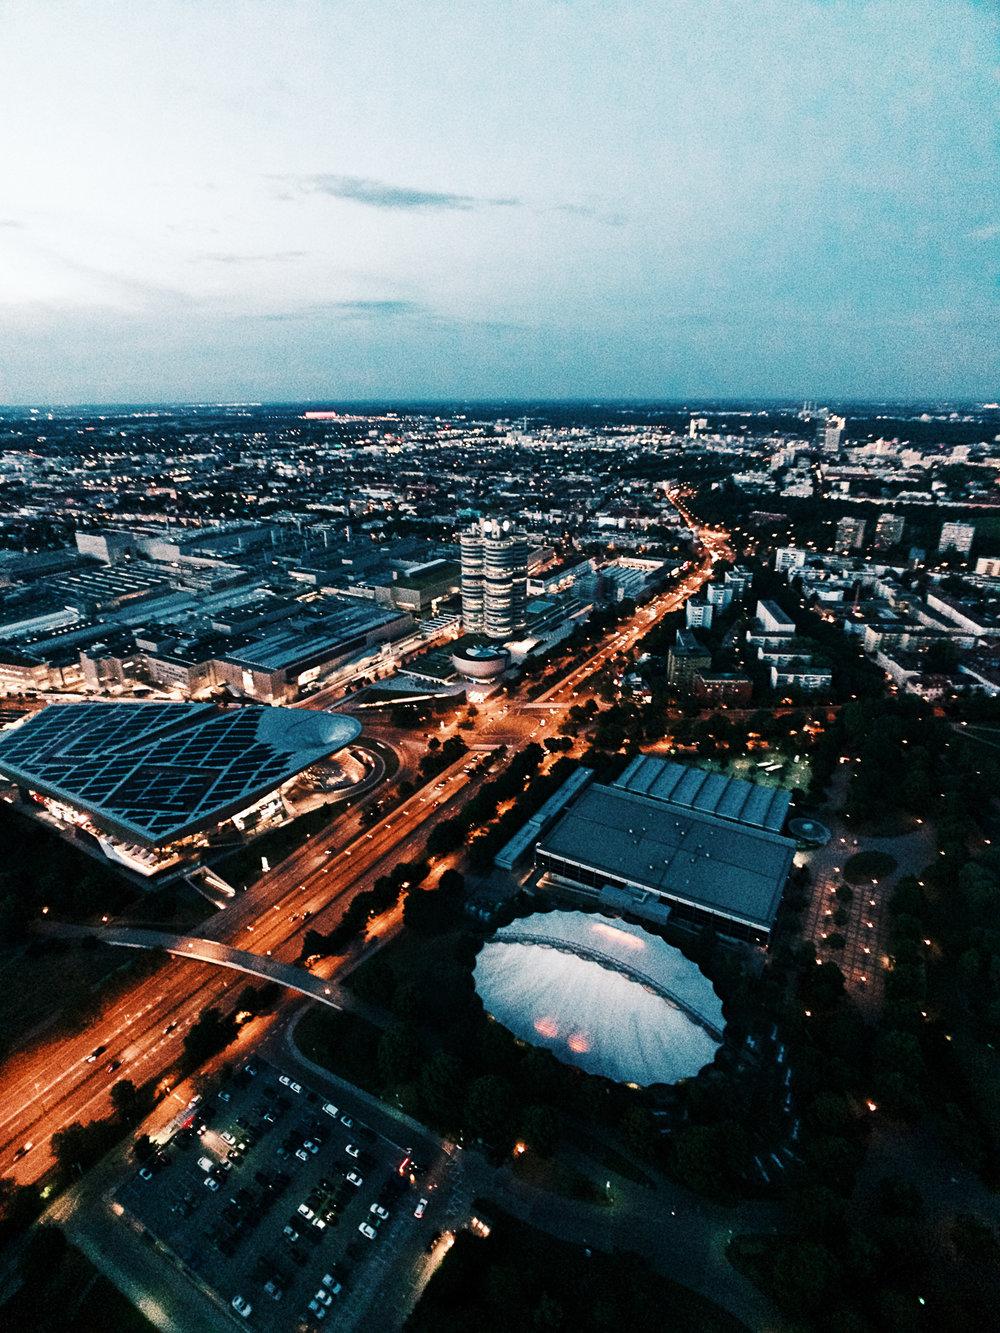 bitplay Olympiapark Tower | Y!PE 關於德國生活與旅遊的社群媒體-9.jpg